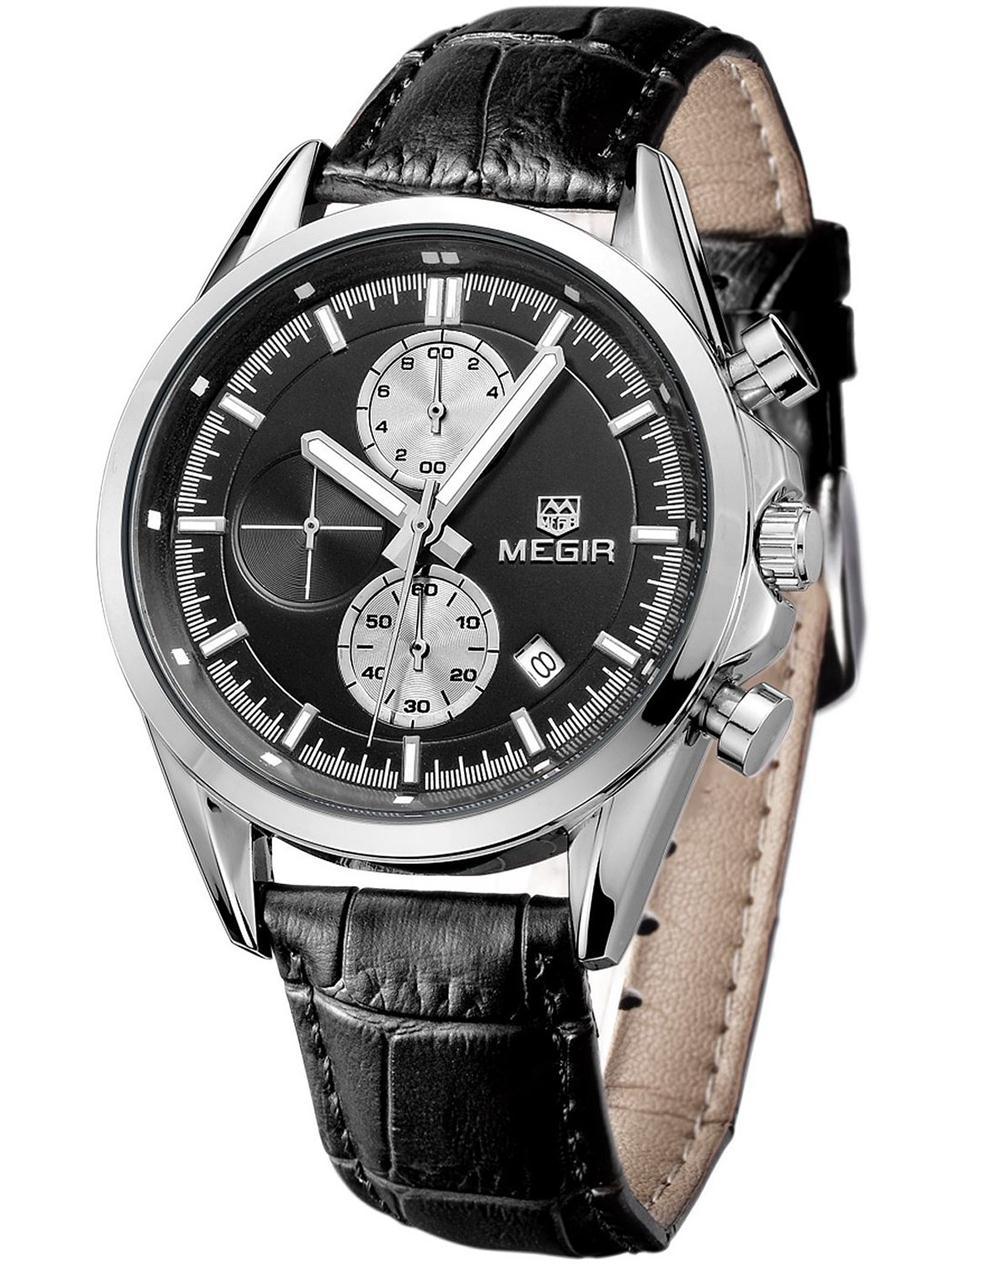 MEGIR Brand 2015 Mens Business Casual Watch Analog Quartz Leather Strap Wristwatches WaterProof relogio masculino Dial MGE22<br><br>Aliexpress